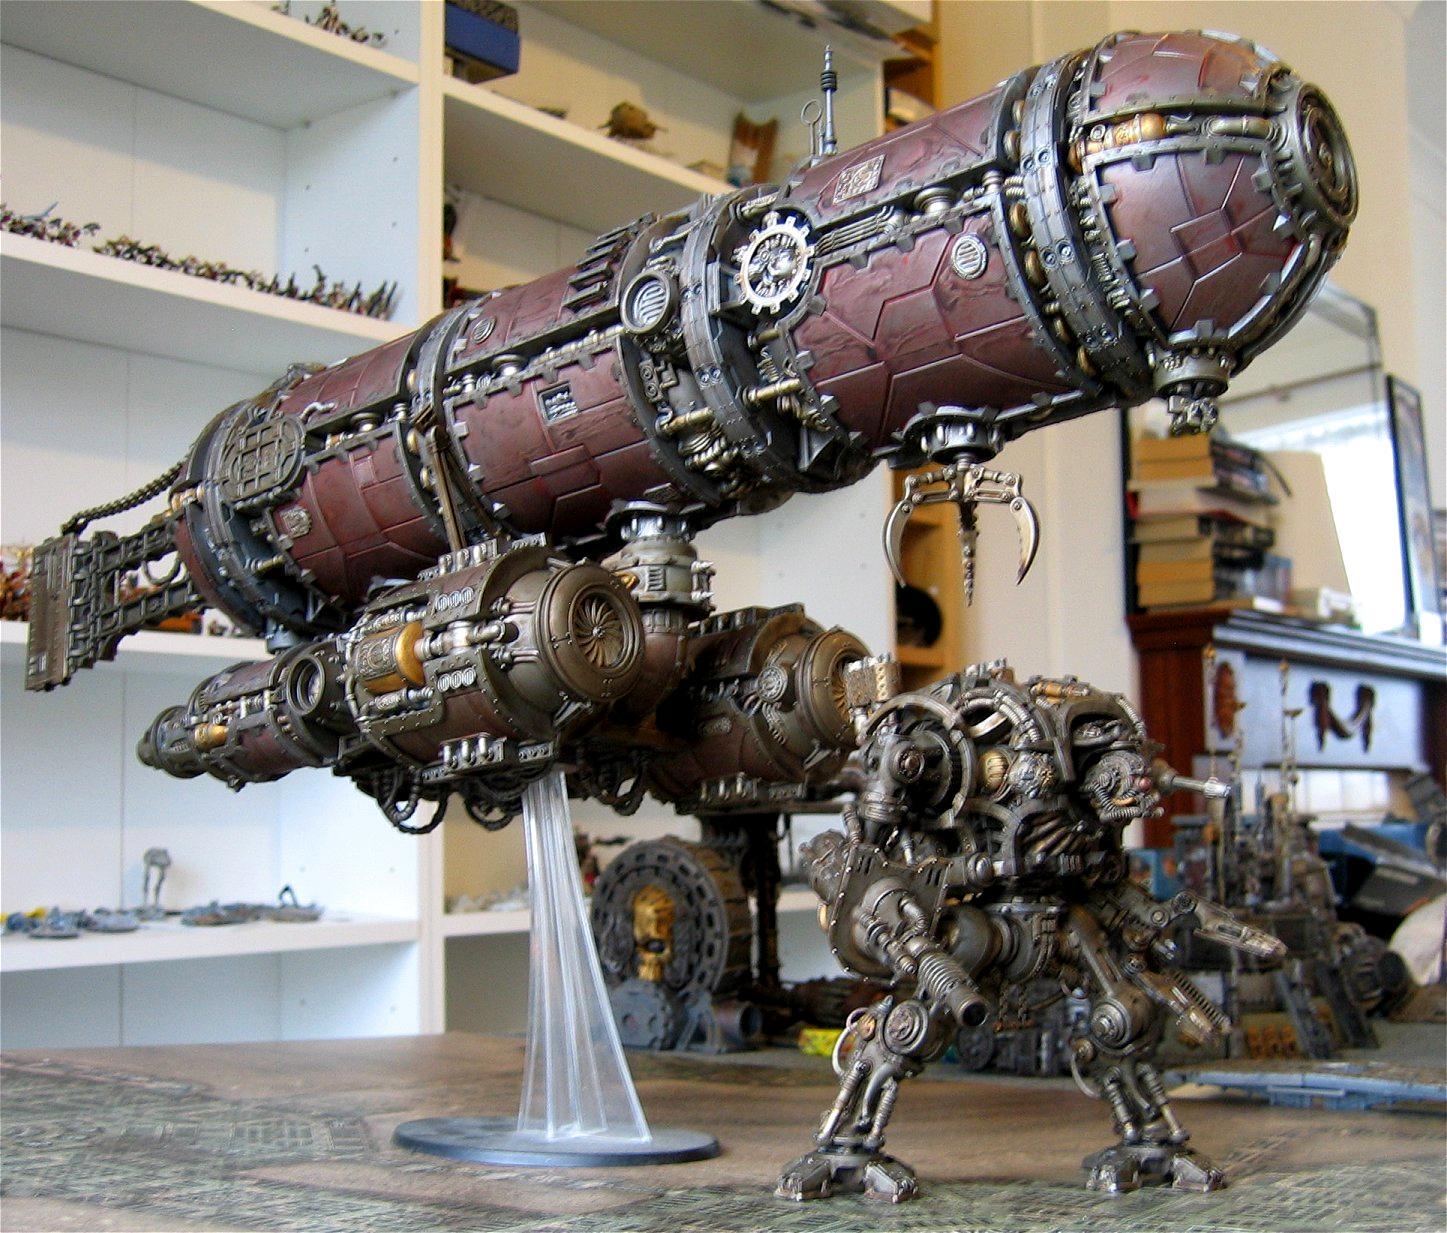 Adeptus Mechanicus, Admech, Airship, Blimp, Mechanicus, Warhammer 40,000